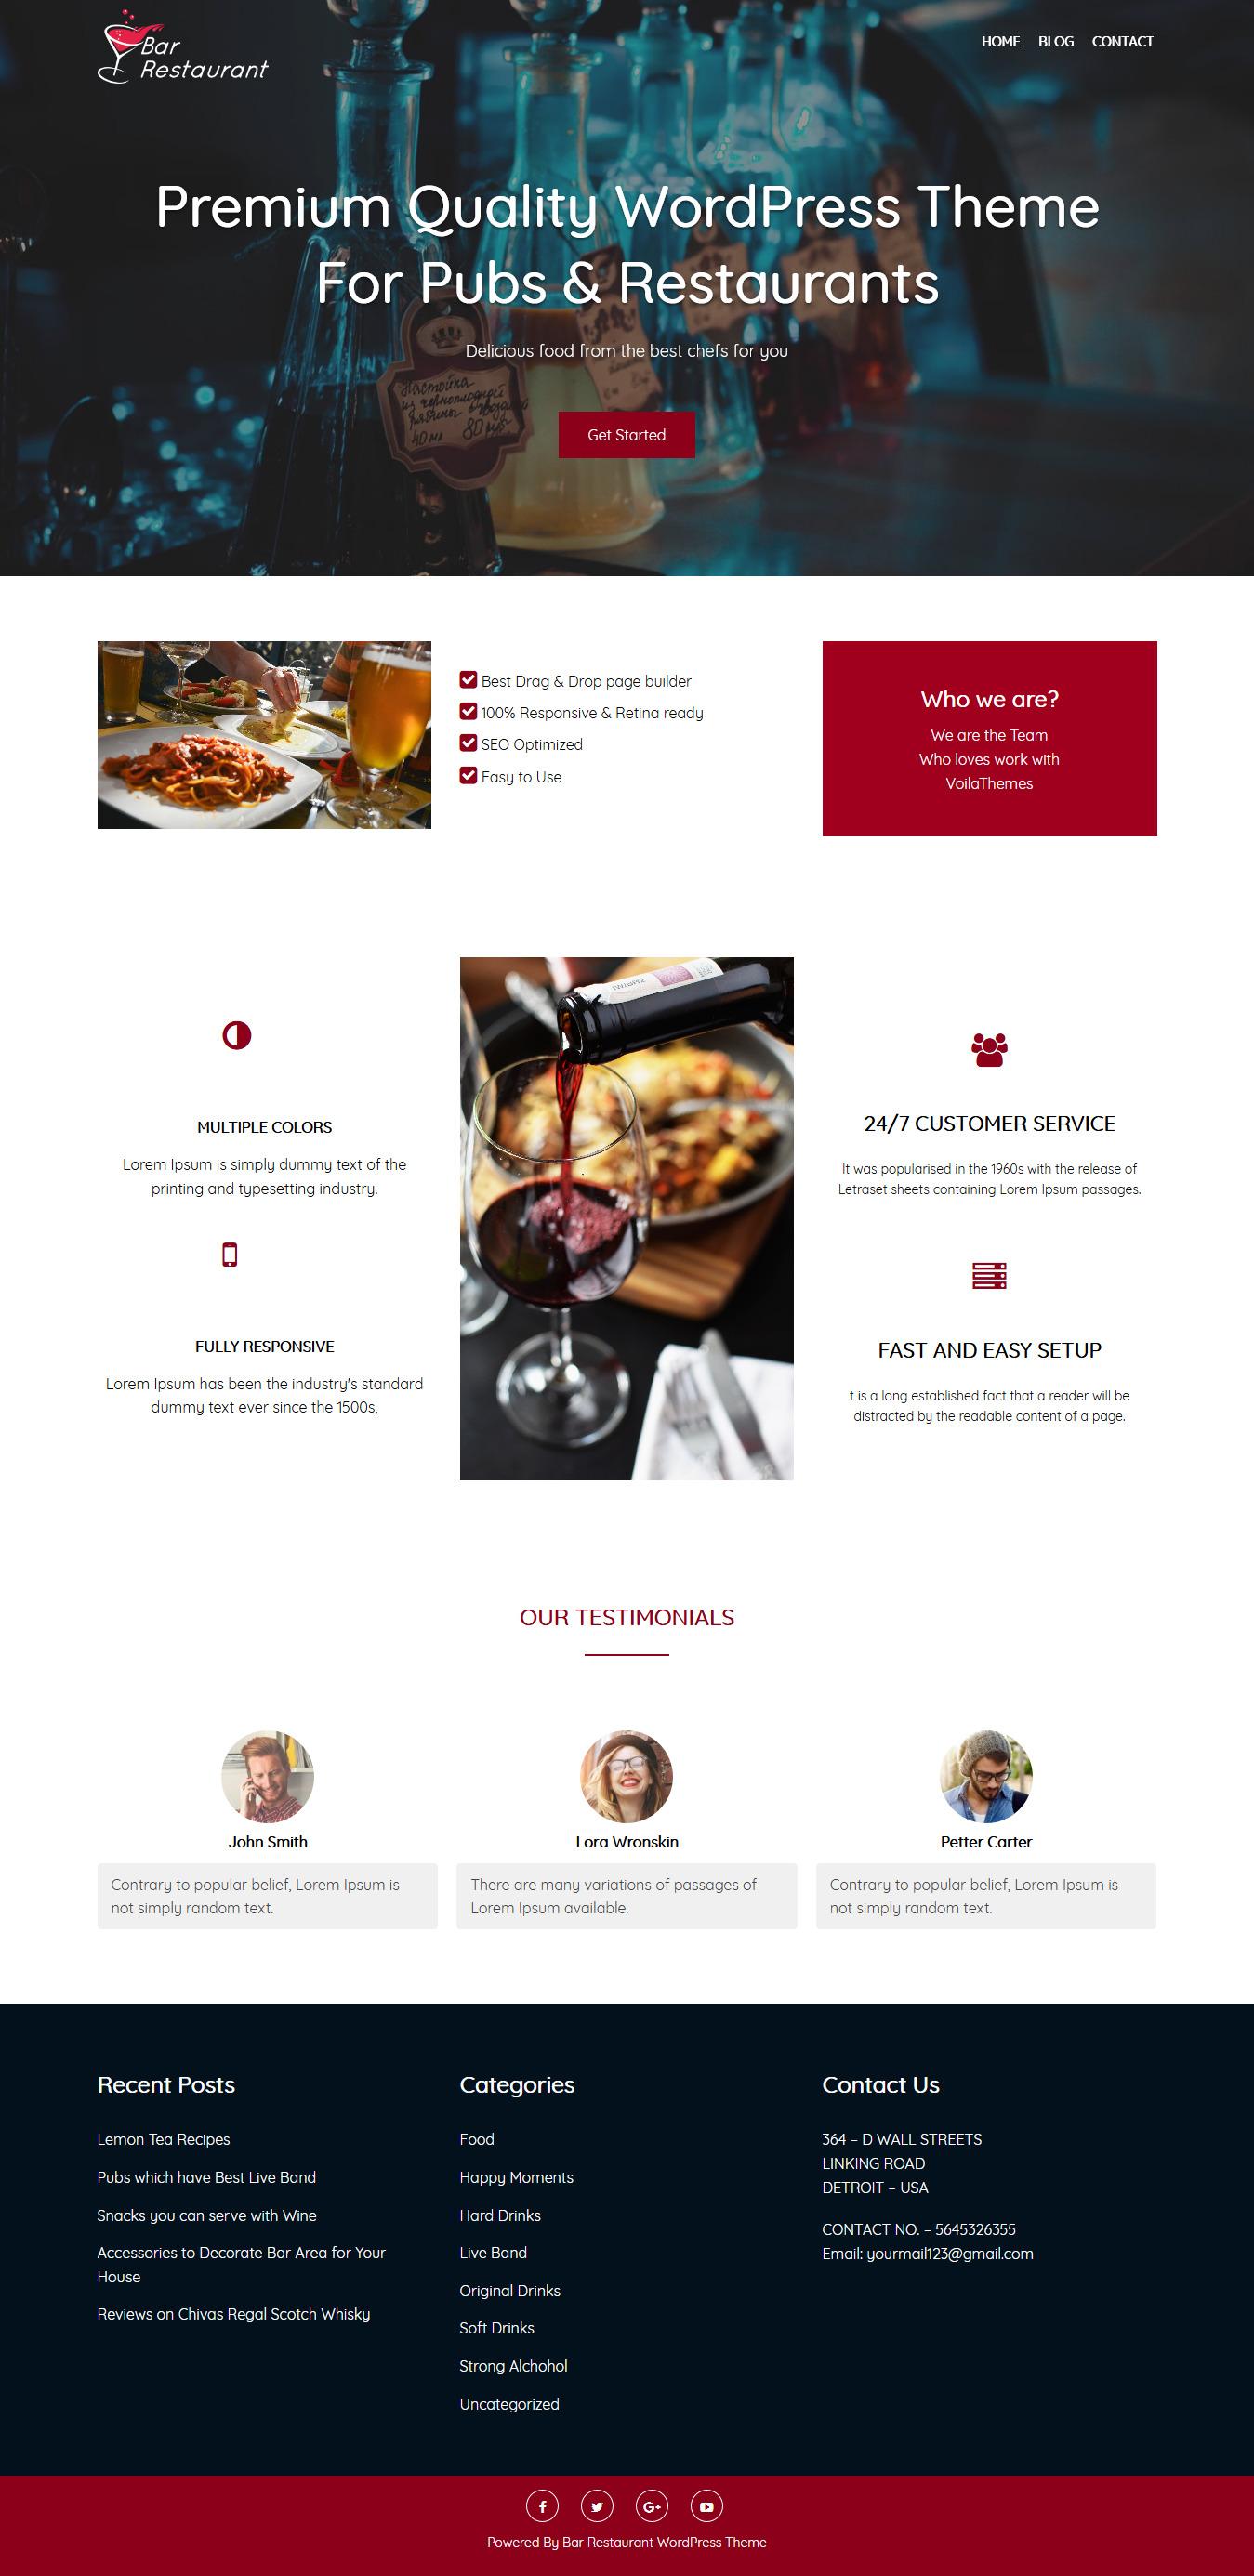 bar restaurant best free bar pub wordpress theme - 10+ Best Free Bar and Pub WordPress Themes